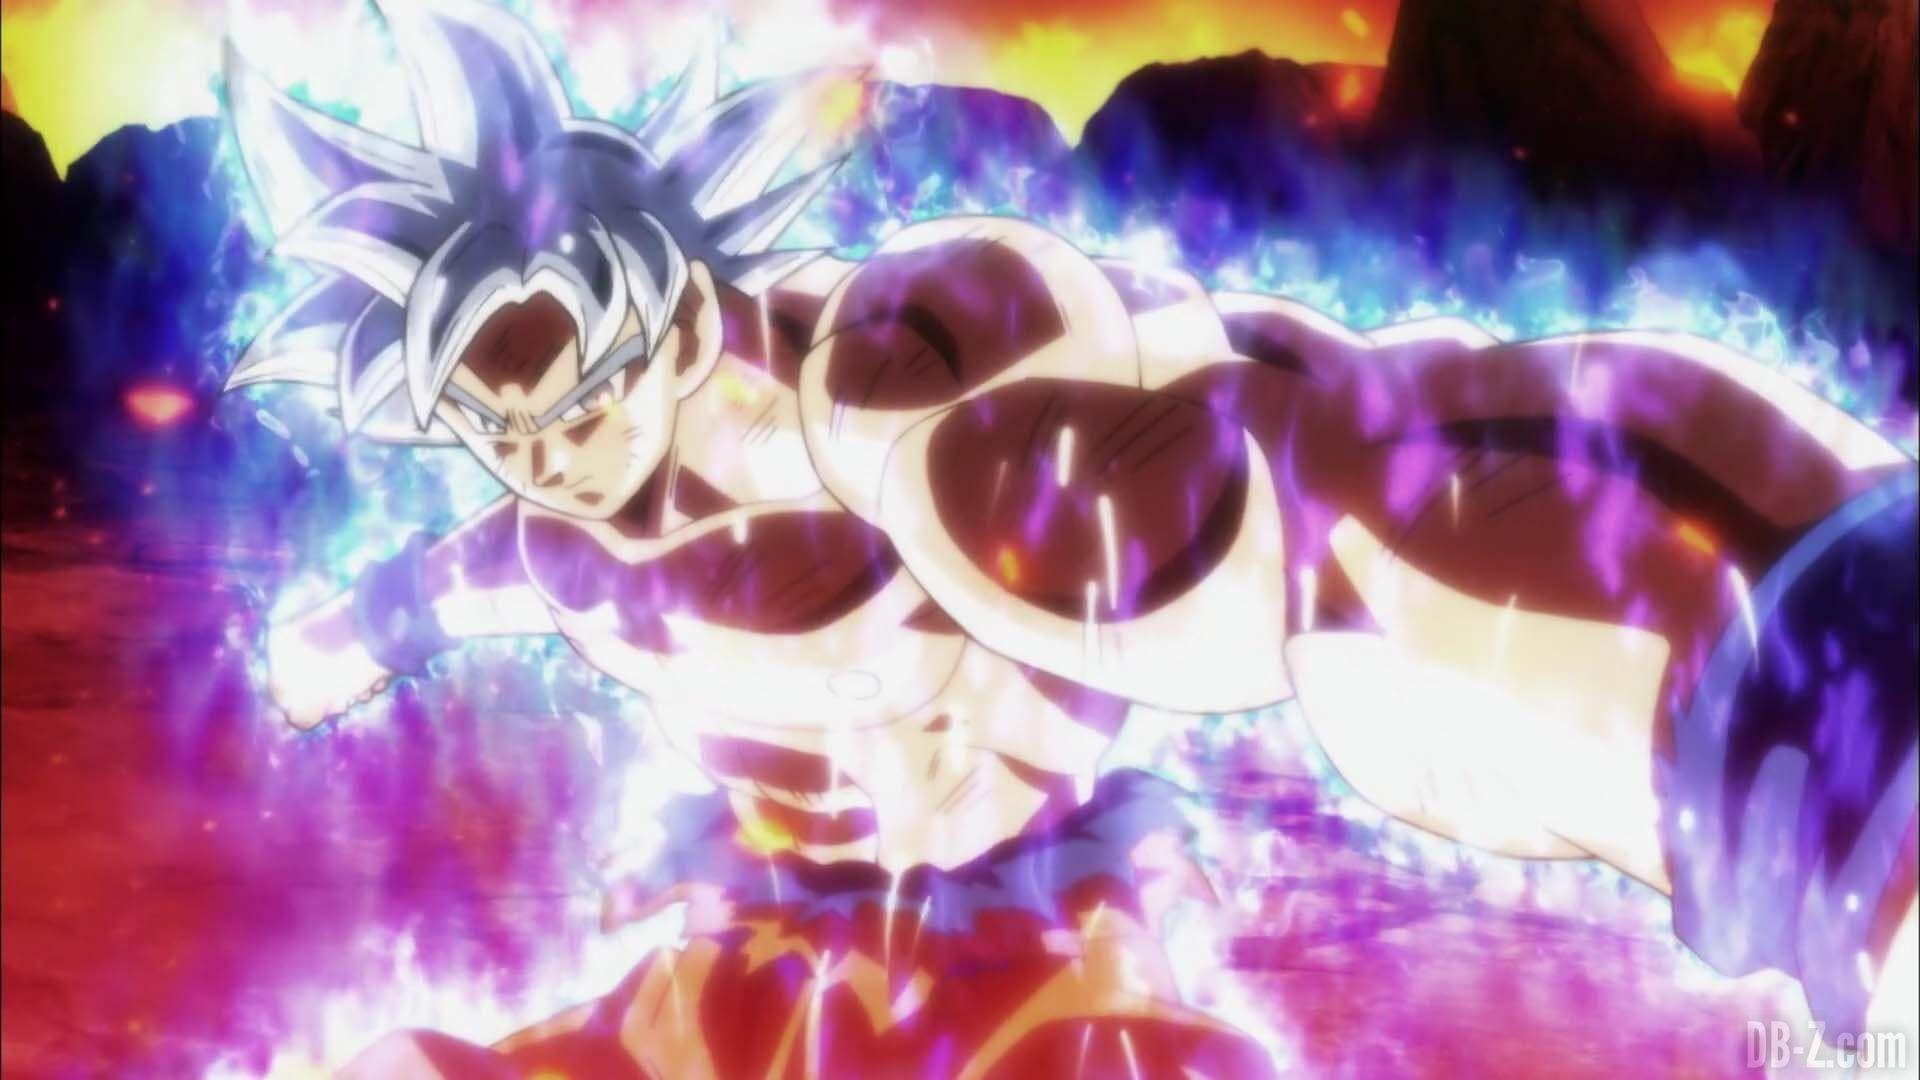 Dragon Ball Super Episode 130 Goku Ultra Instinct Jiren 0100 Dragon Ball Super Dragon Ball Dragon Ball Goku